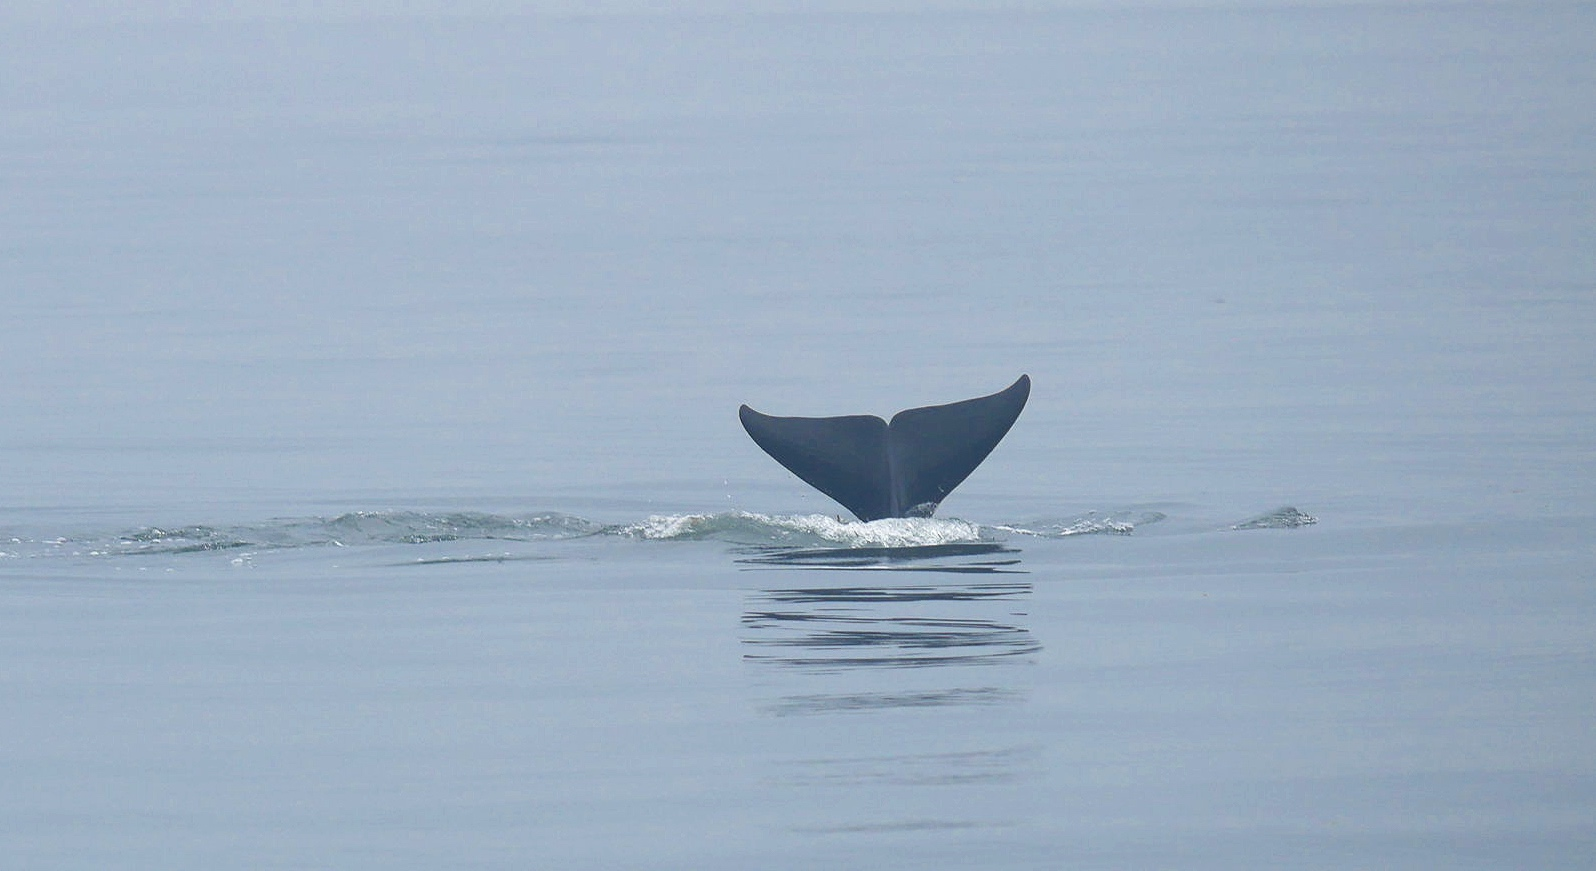 Tail fins! Photo by Cheyenne Brewster. (10:30)